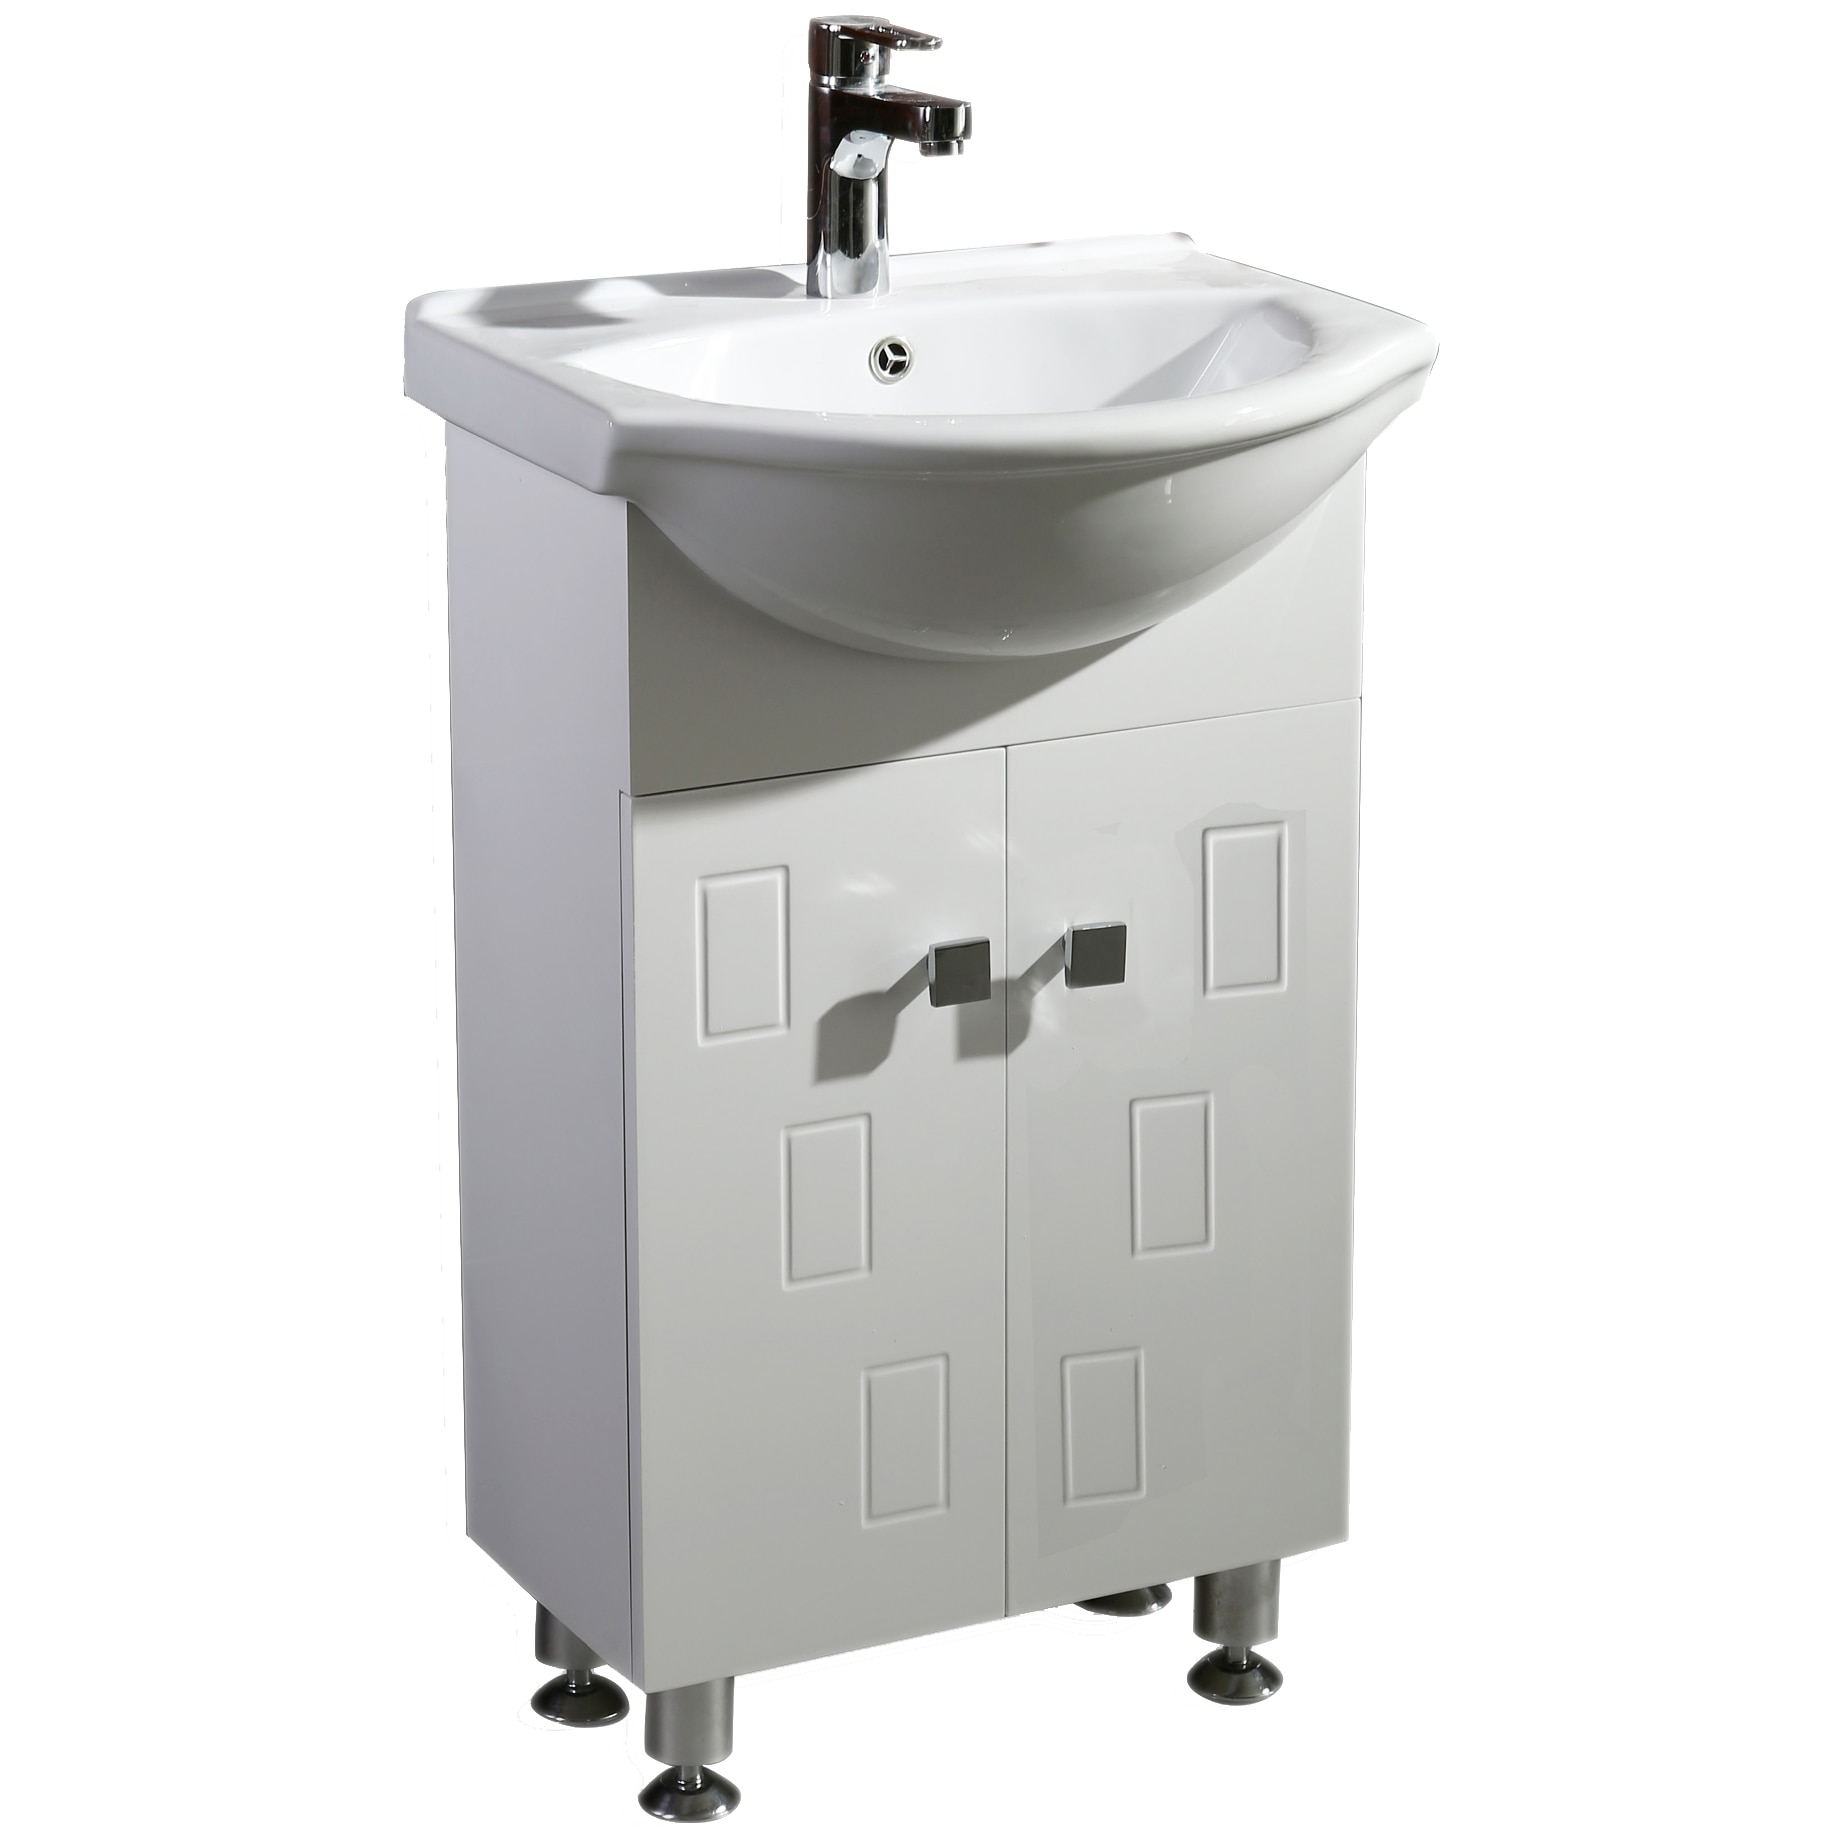 Fotografie Baza mobilier Inter Ceramic, inchidere soft, PVC cu lavoar ceramic, Alb